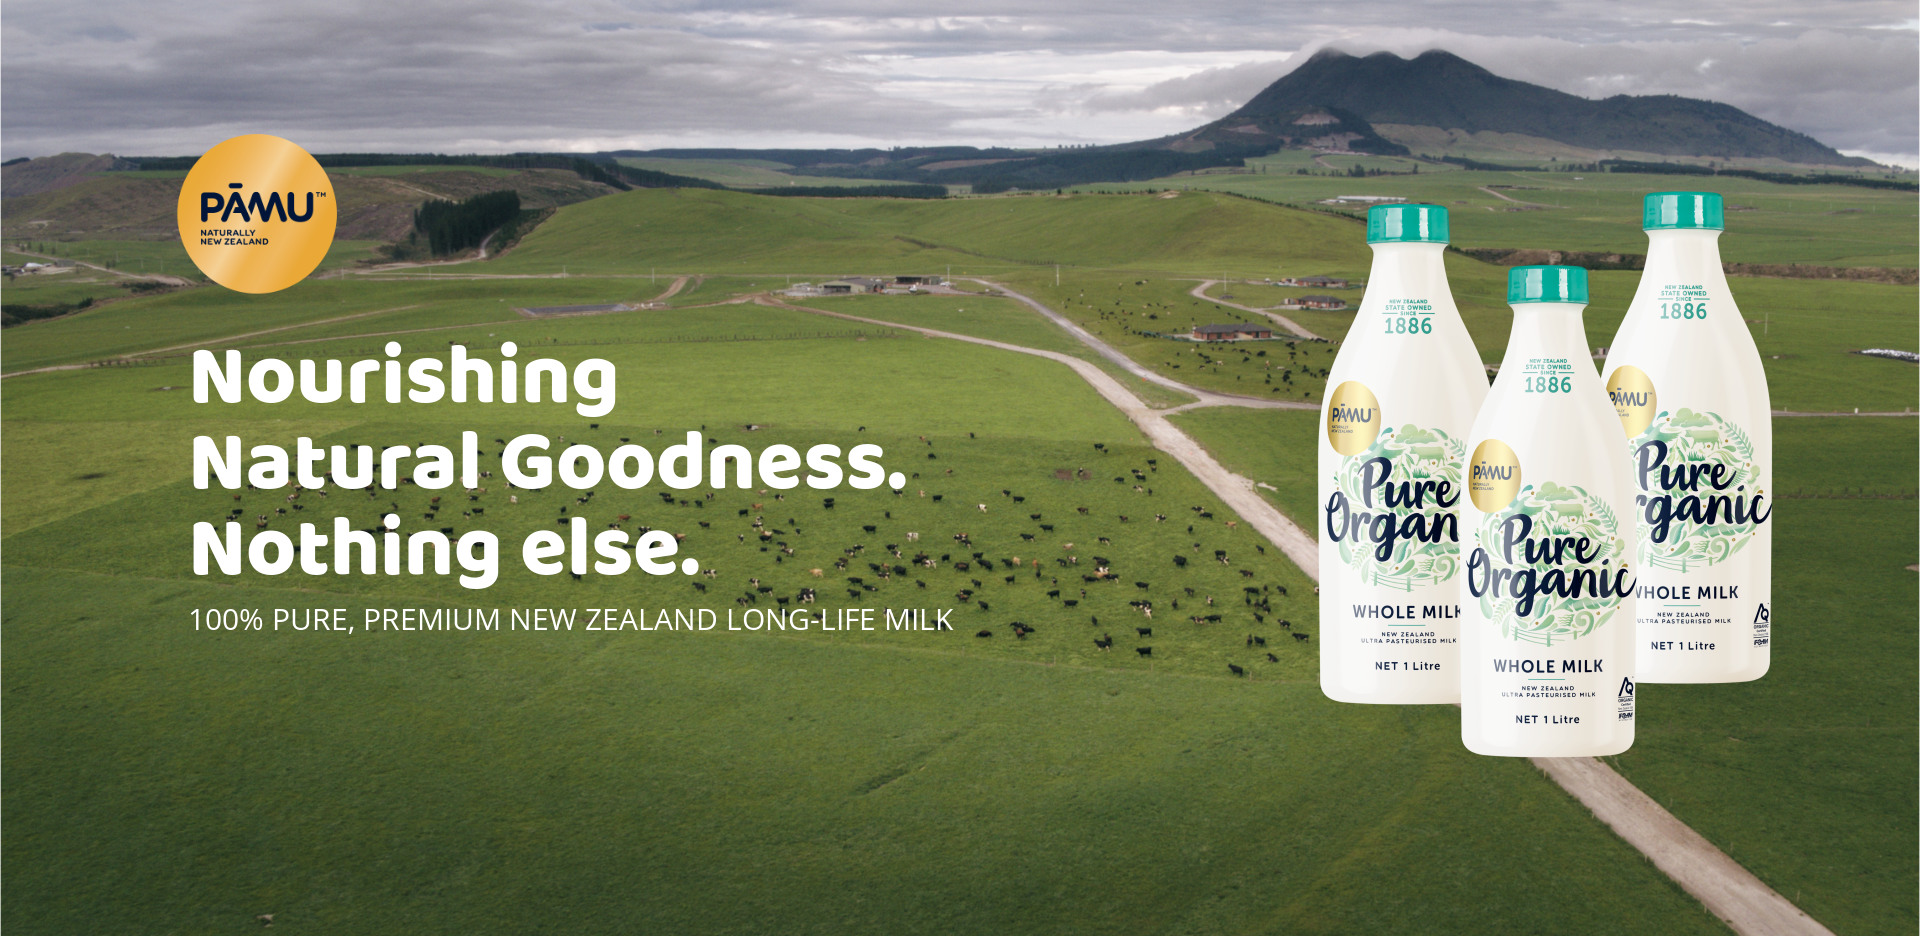 Pamu Milk